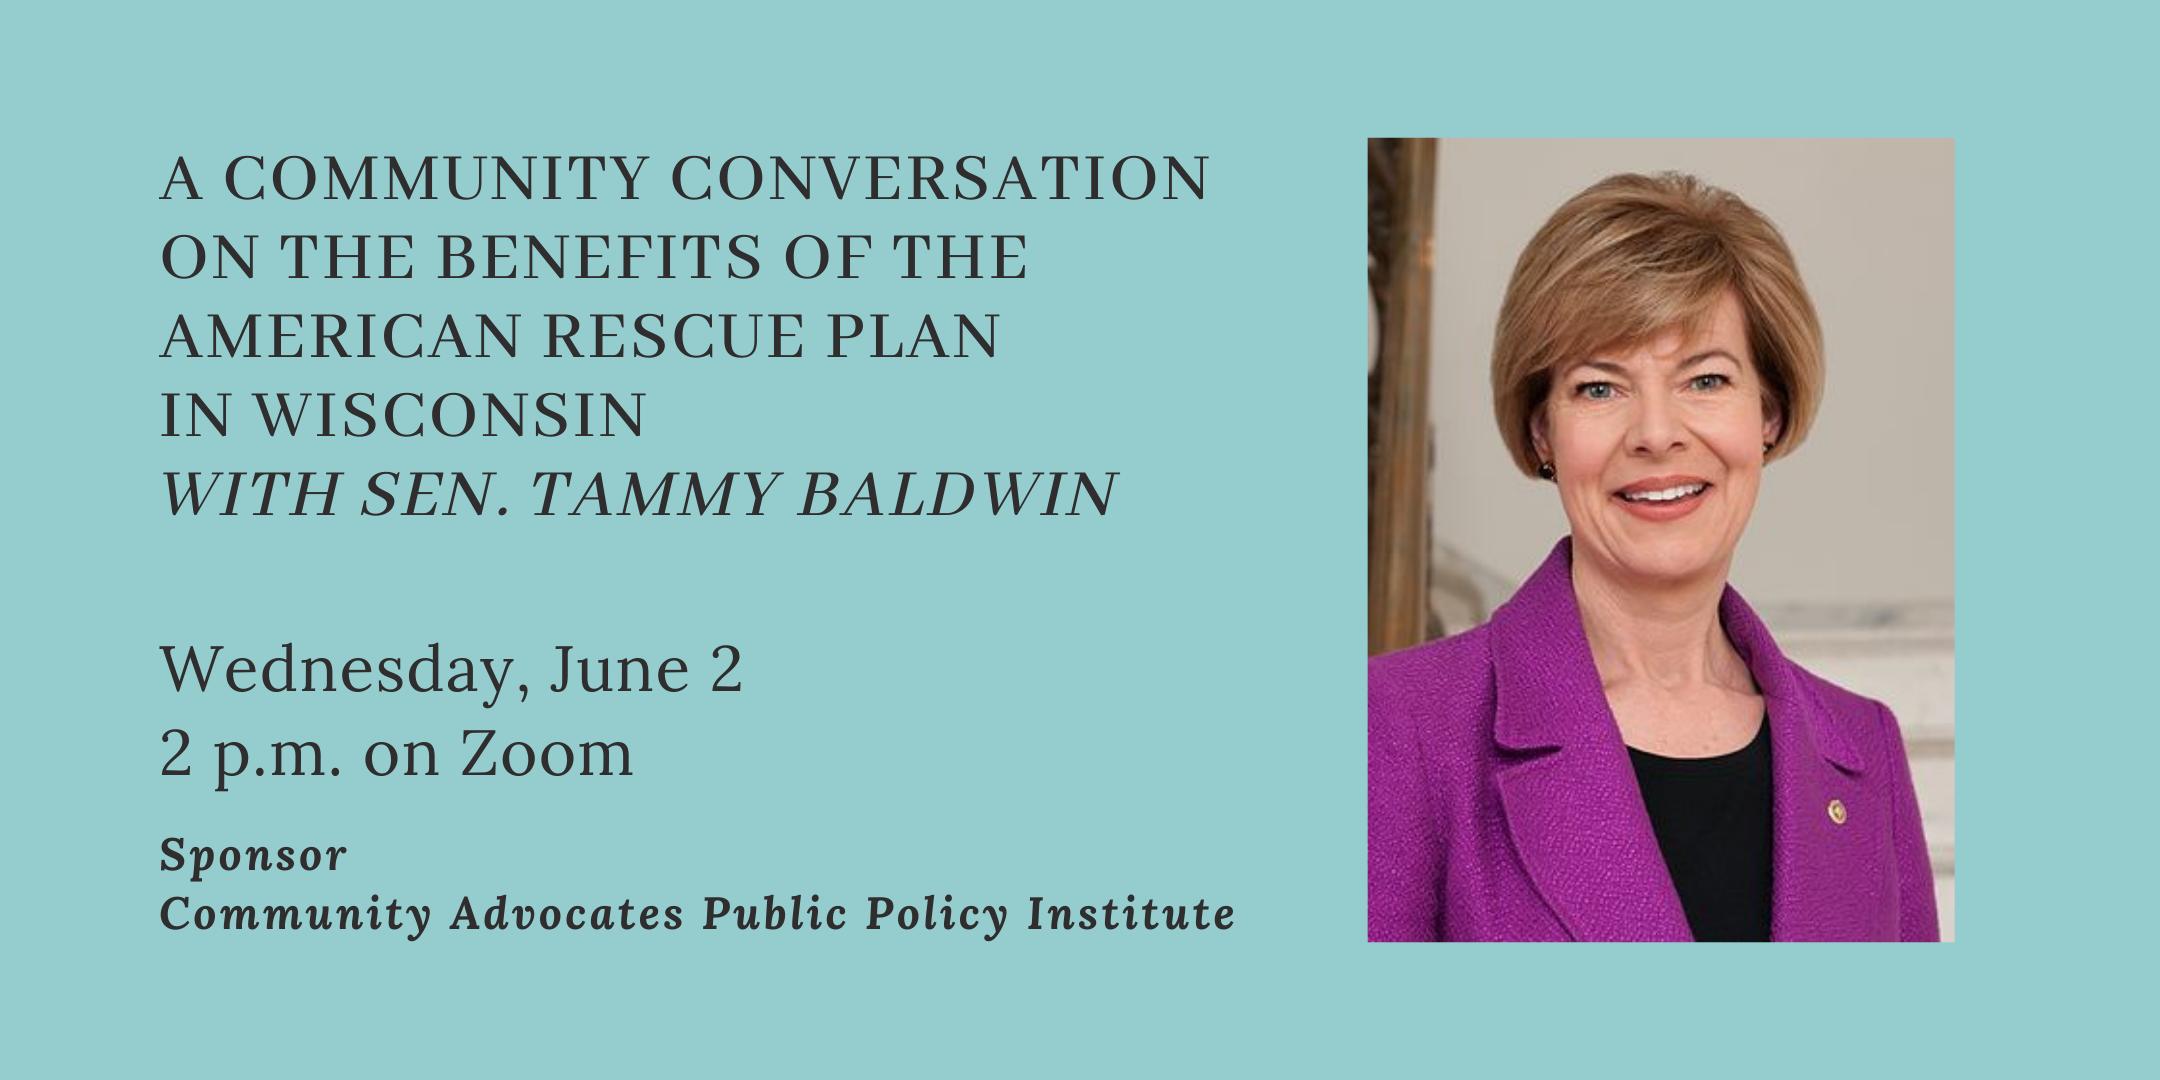 Sen. Tammy Baldwin on American Rescue Plan